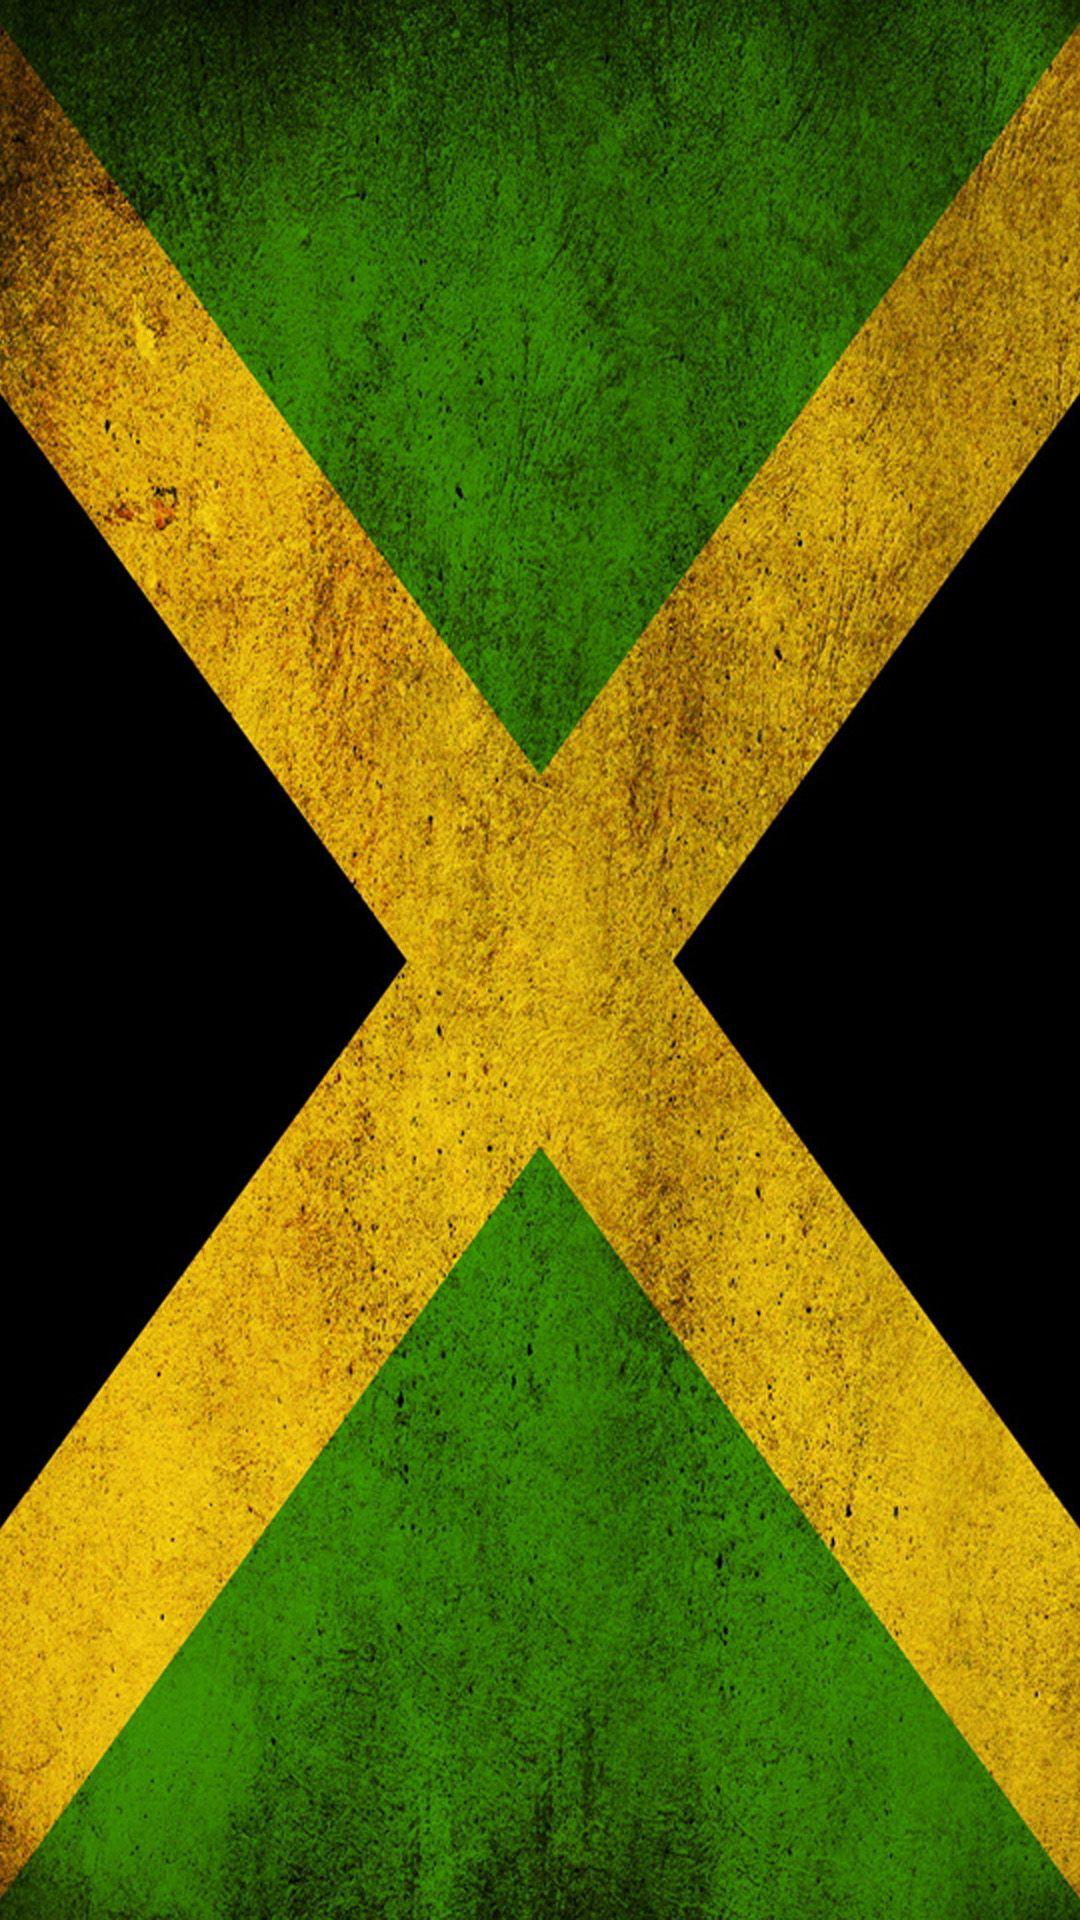 jamaican flag wallpaper - photo #13